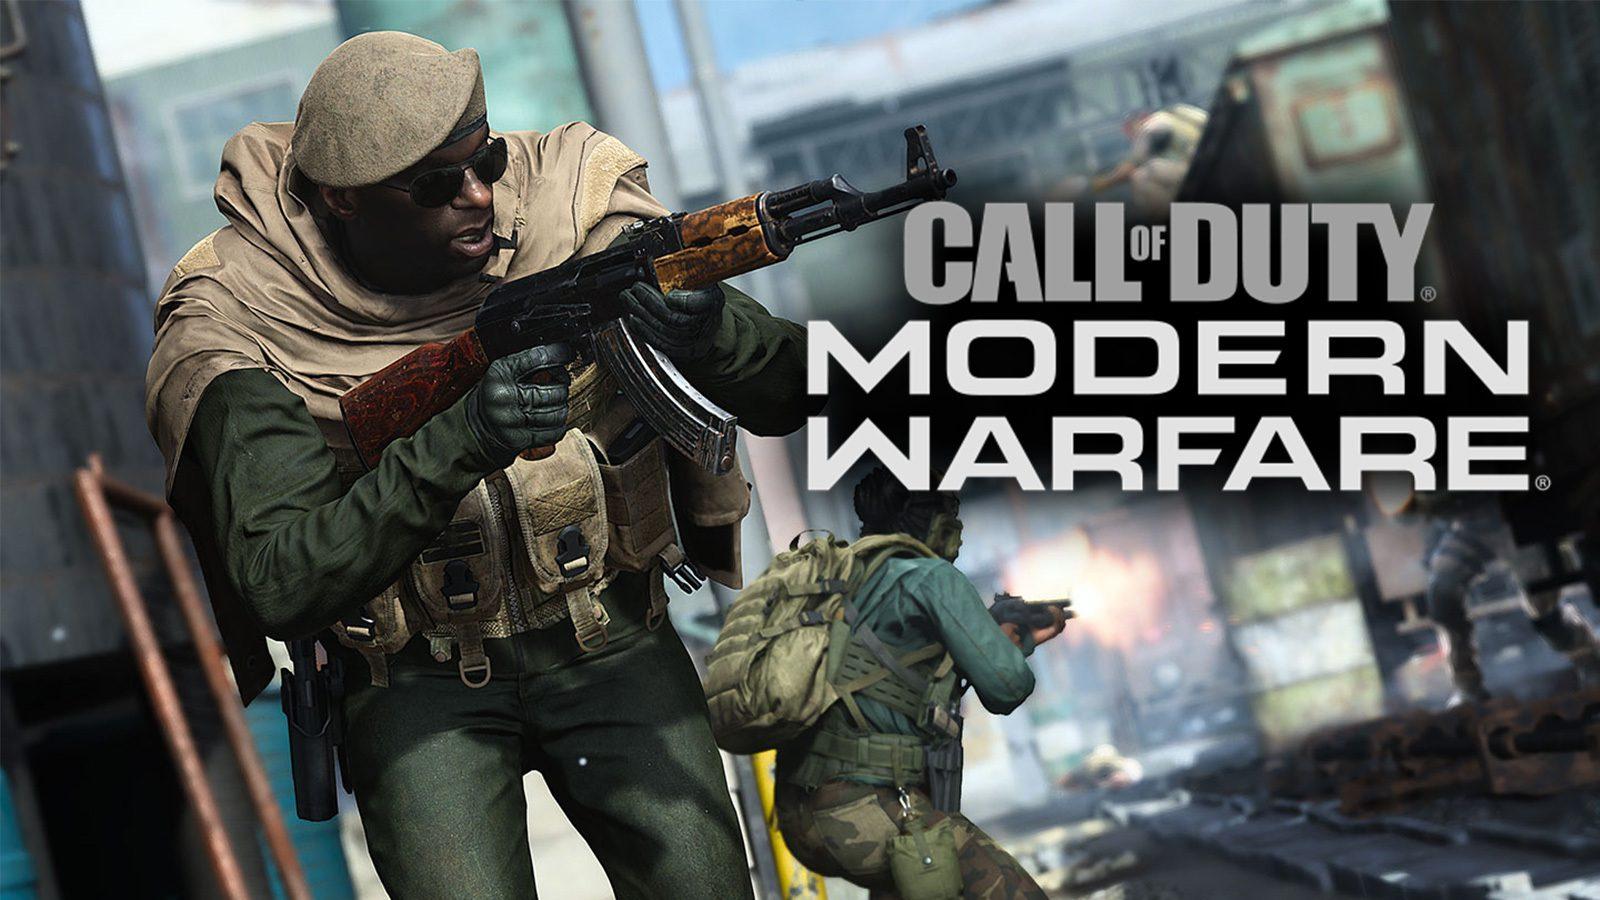 All The Call Of Duty: Modern Warfare